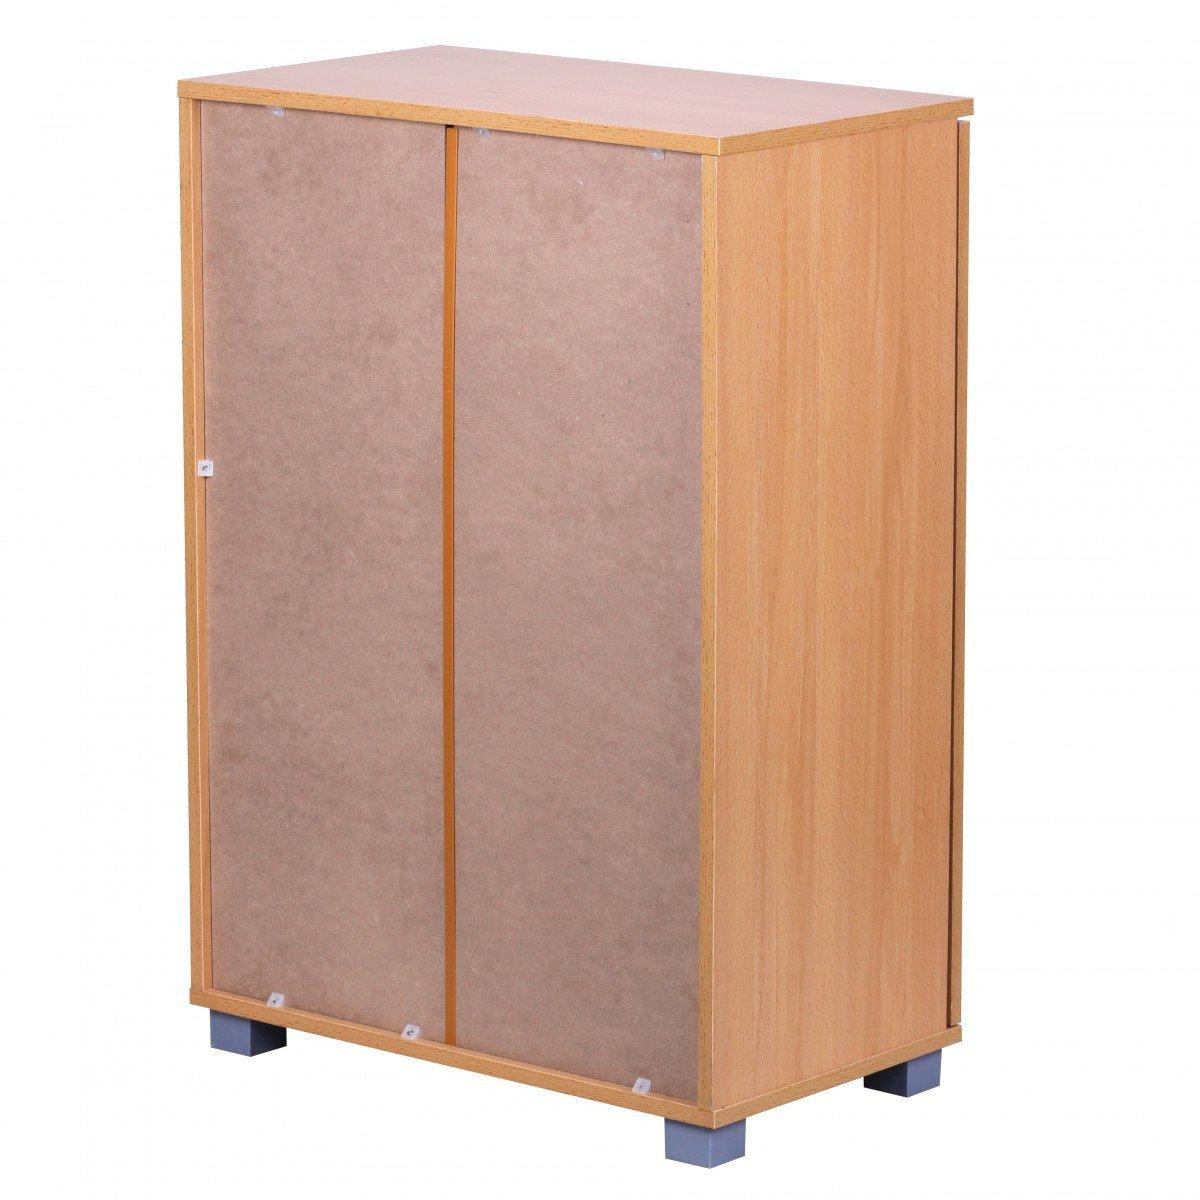 2 90 breit good uno trig manchester with 2 90 breit. Black Bedroom Furniture Sets. Home Design Ideas